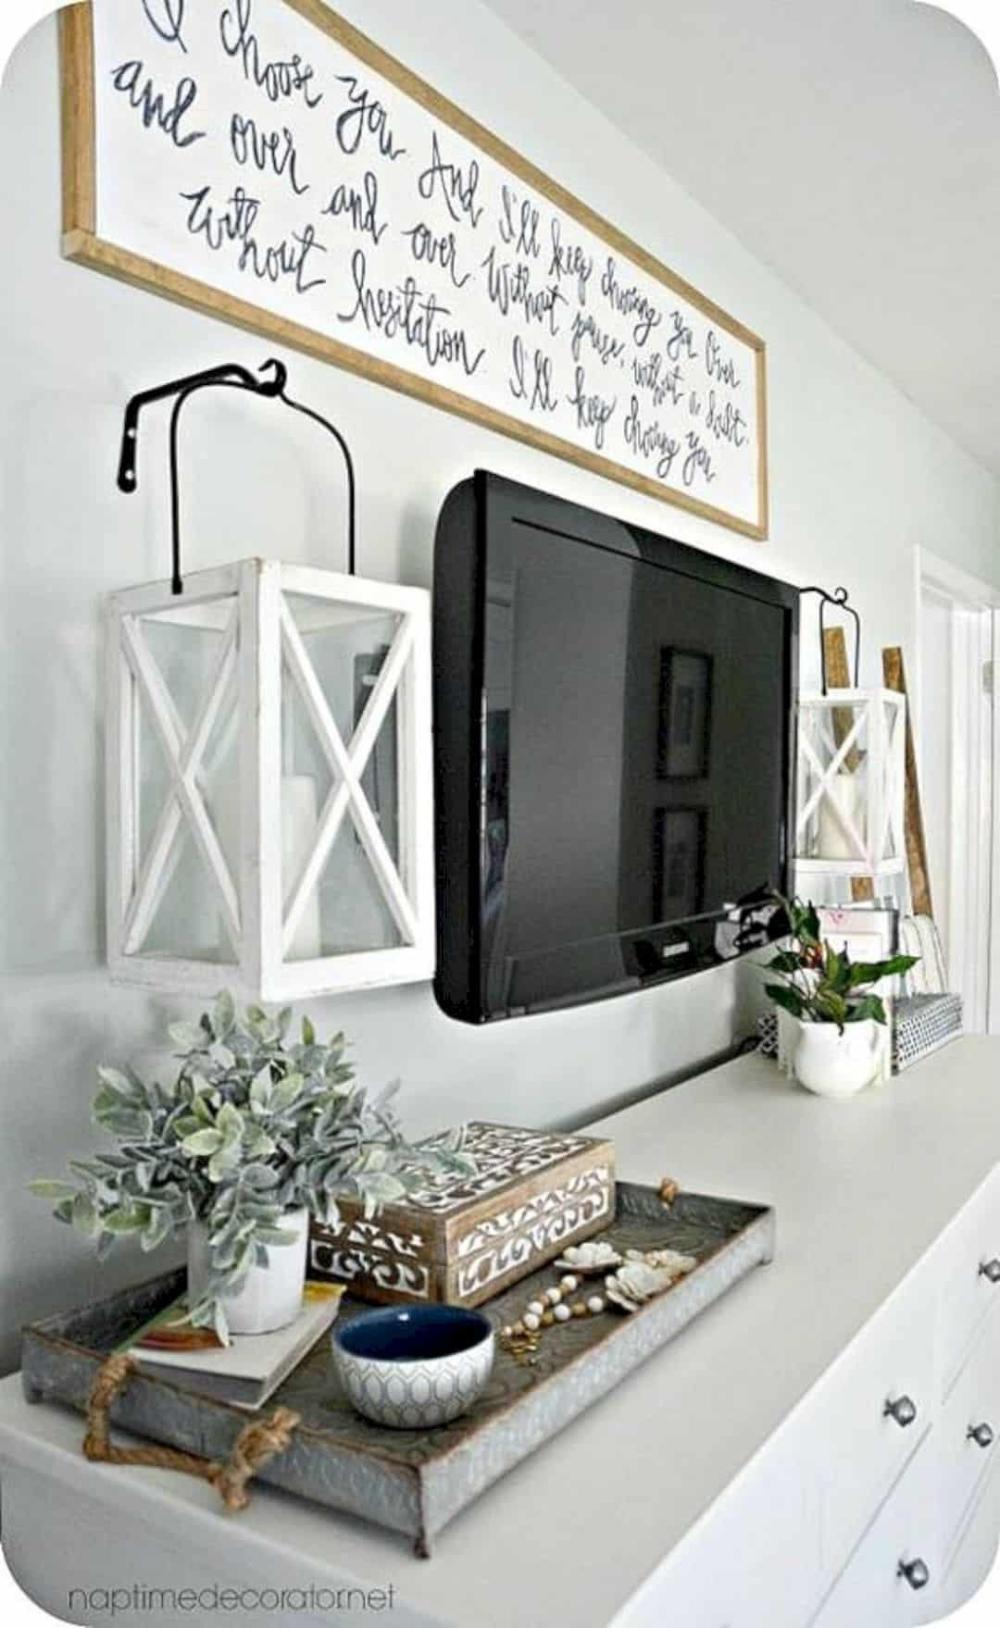 5 Modern Rustic Home Decor Ideas For Living Room Bedroom Tv Wall Farm House Living Room Apartment Decor